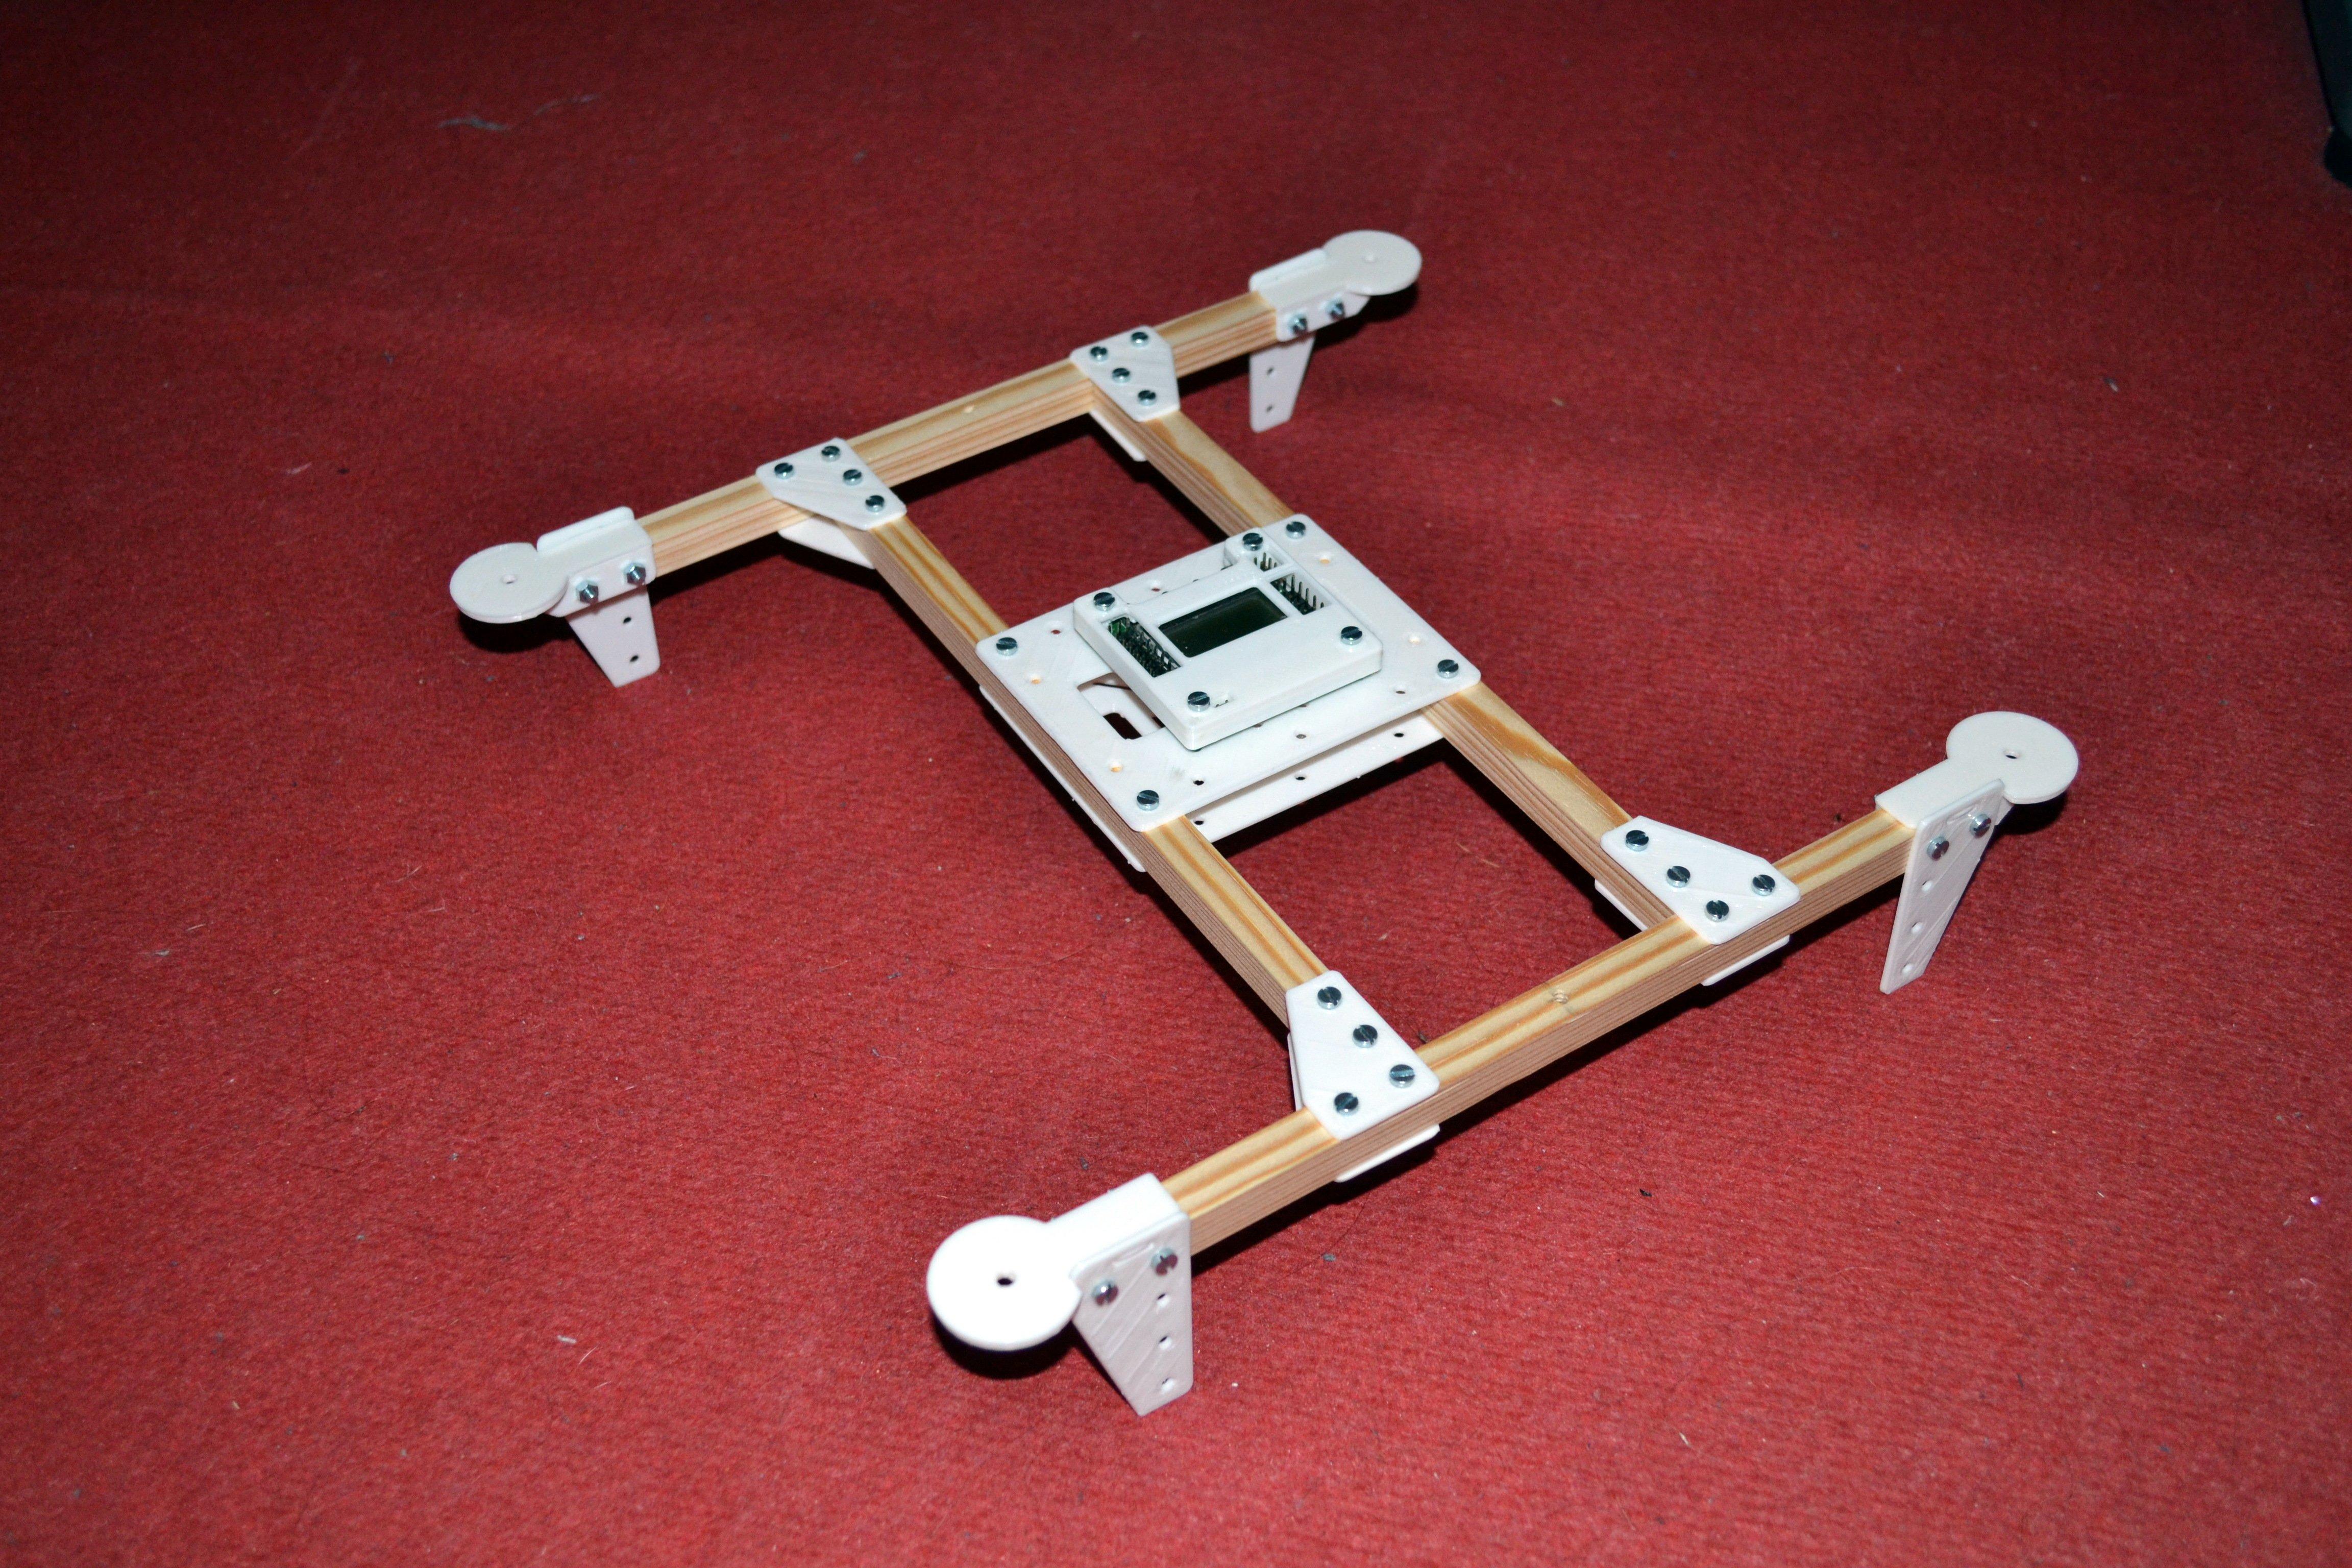 3D Printed FT Rotor Bones Knuckle Hubs | Flite Test